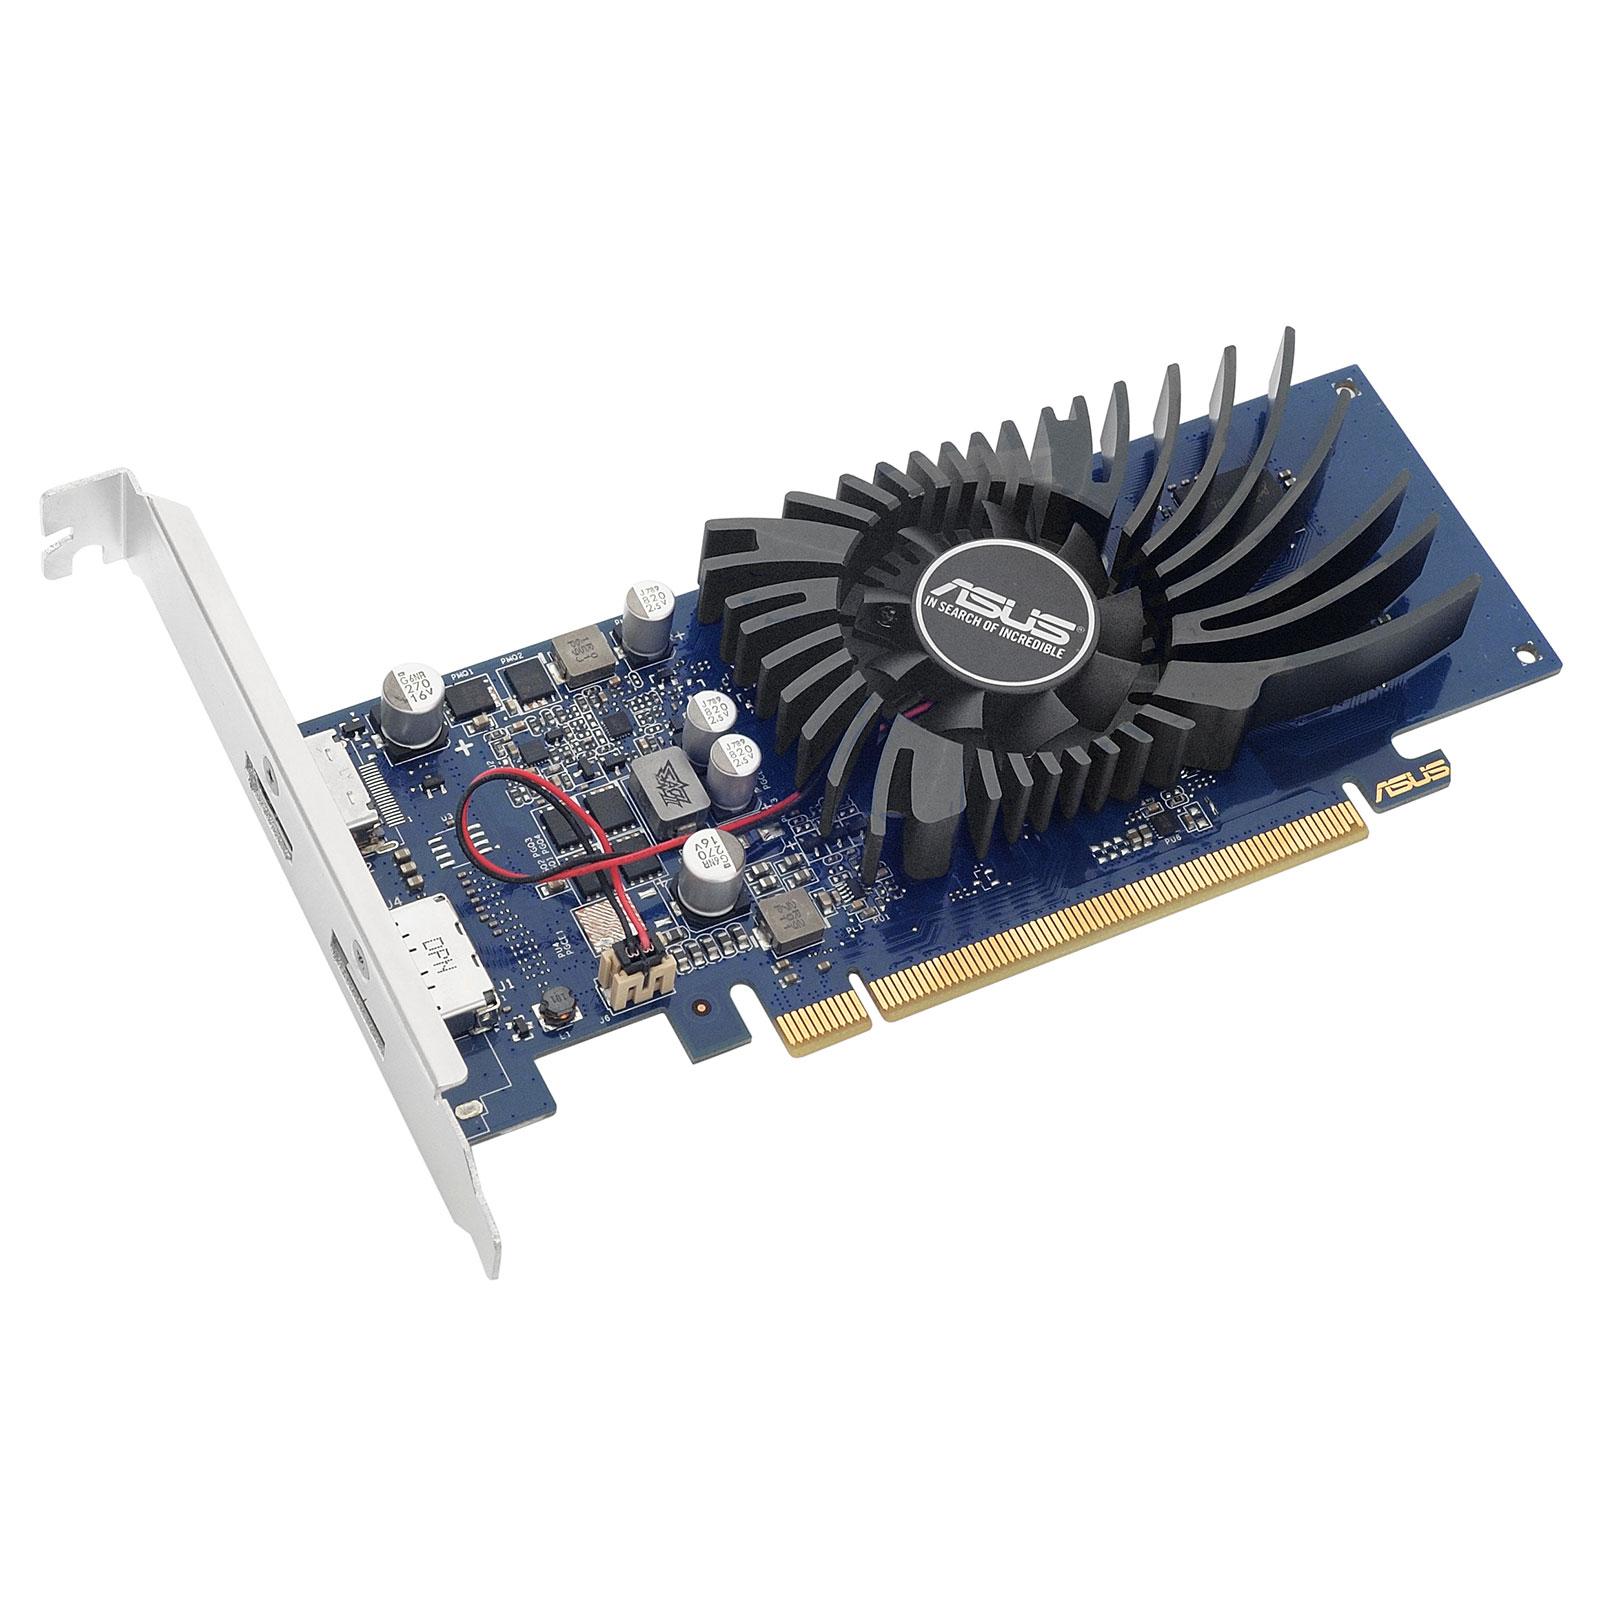 Carte graphique ASUS GeForce GT 1030 2 Go - GT1030-2G-BRK 2048 Mo DisplayPortI/HDMI - PCI Express (NVIDIA GeForce avec CUDA GT 1030)